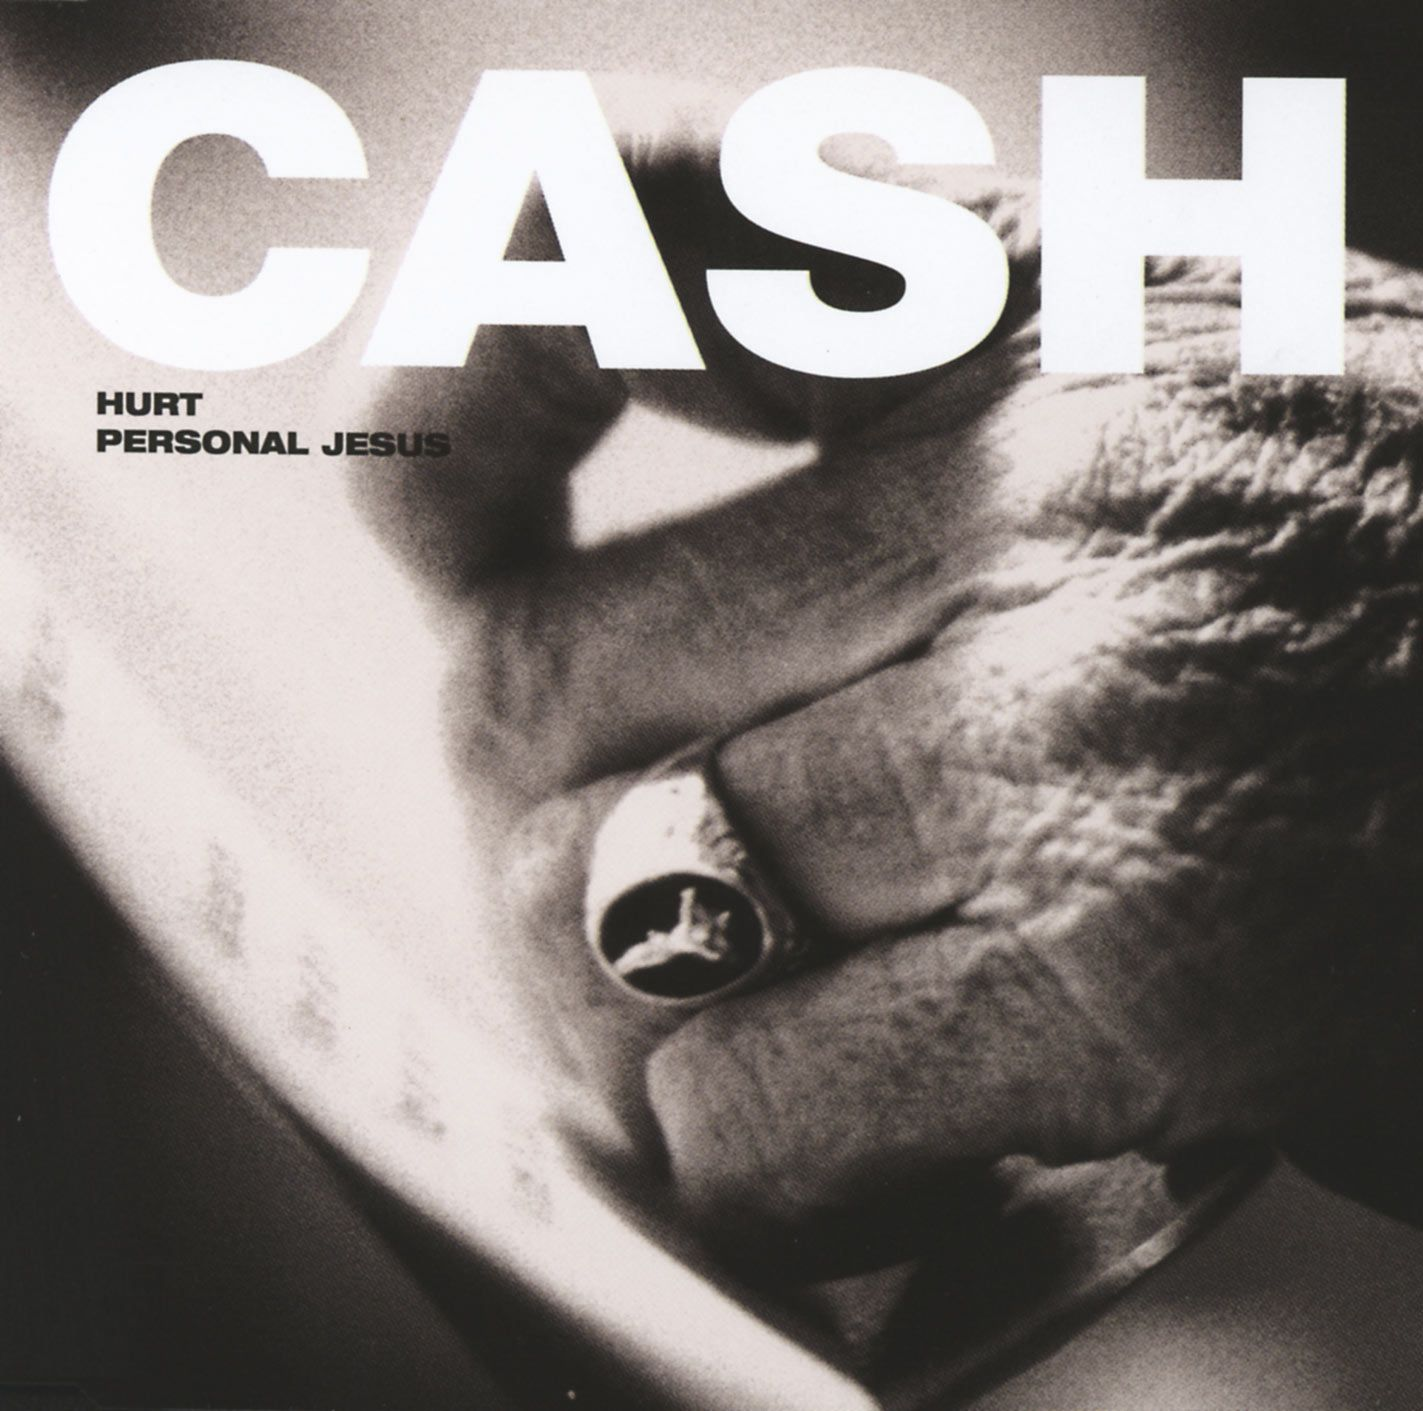 Johnny Cash - Hurt - Single Cover